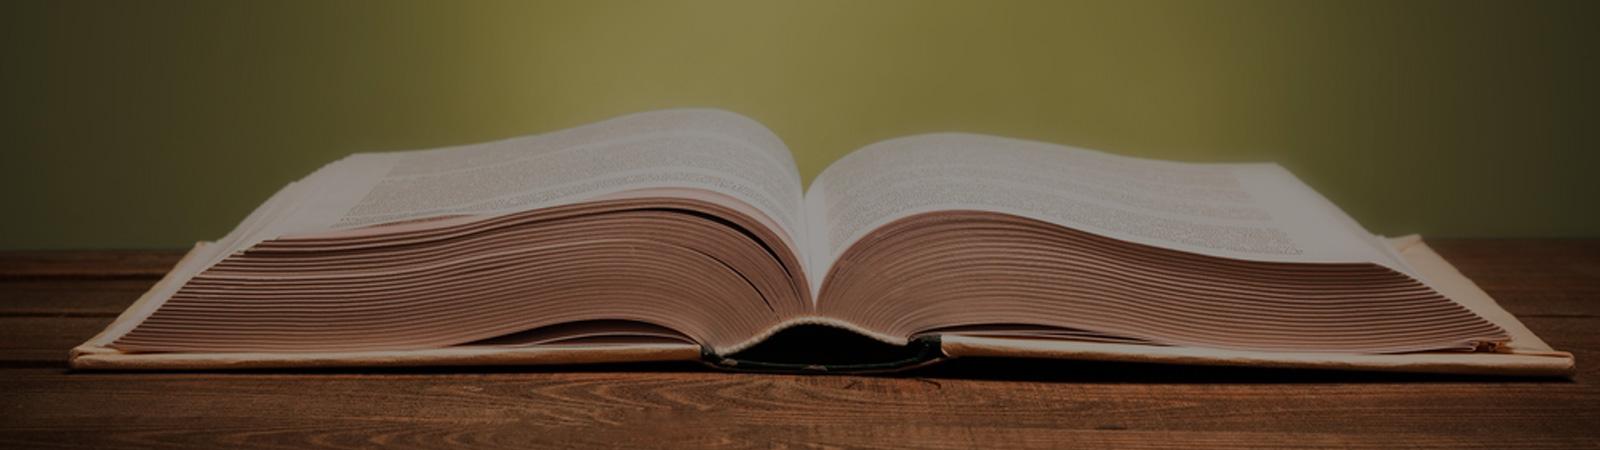 BOOK REVIEW: The Wristwatch Handbook by Ryan Schmidt